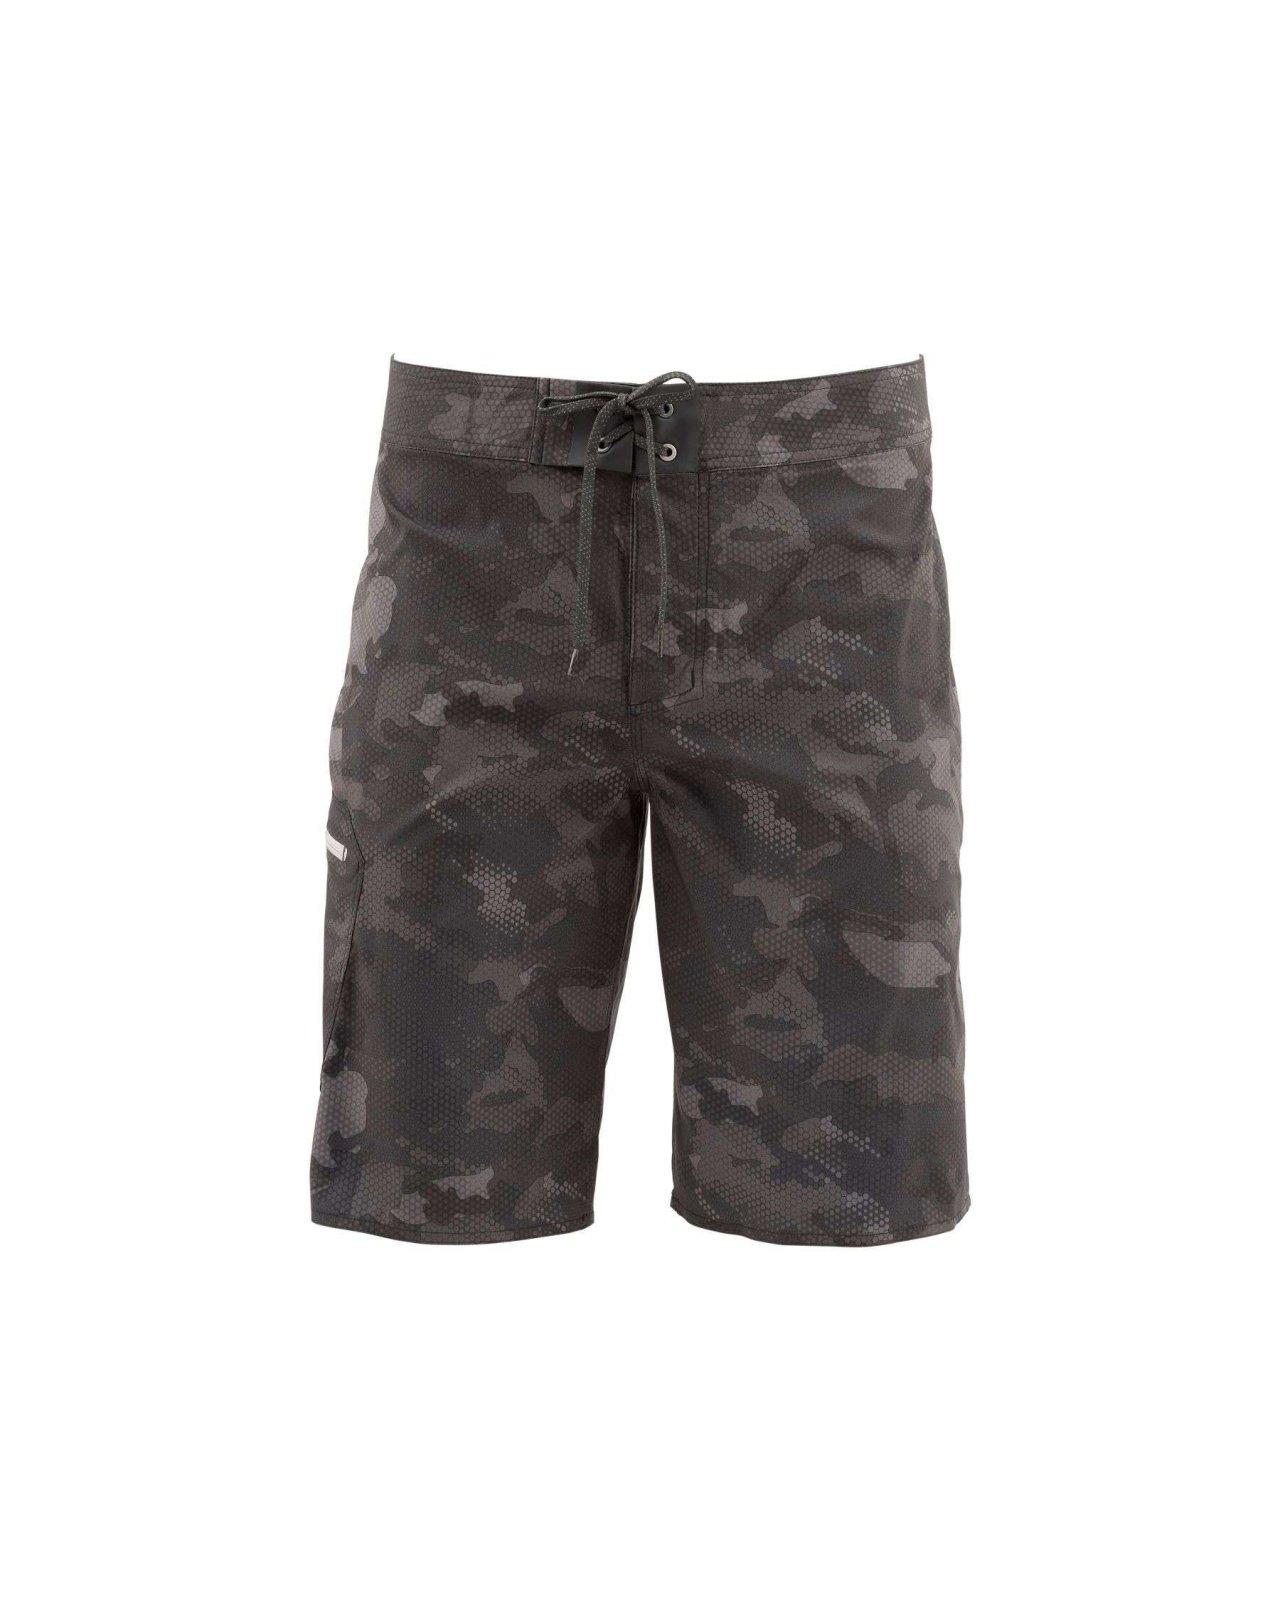 Simms Men's Tumunu Board Shorts